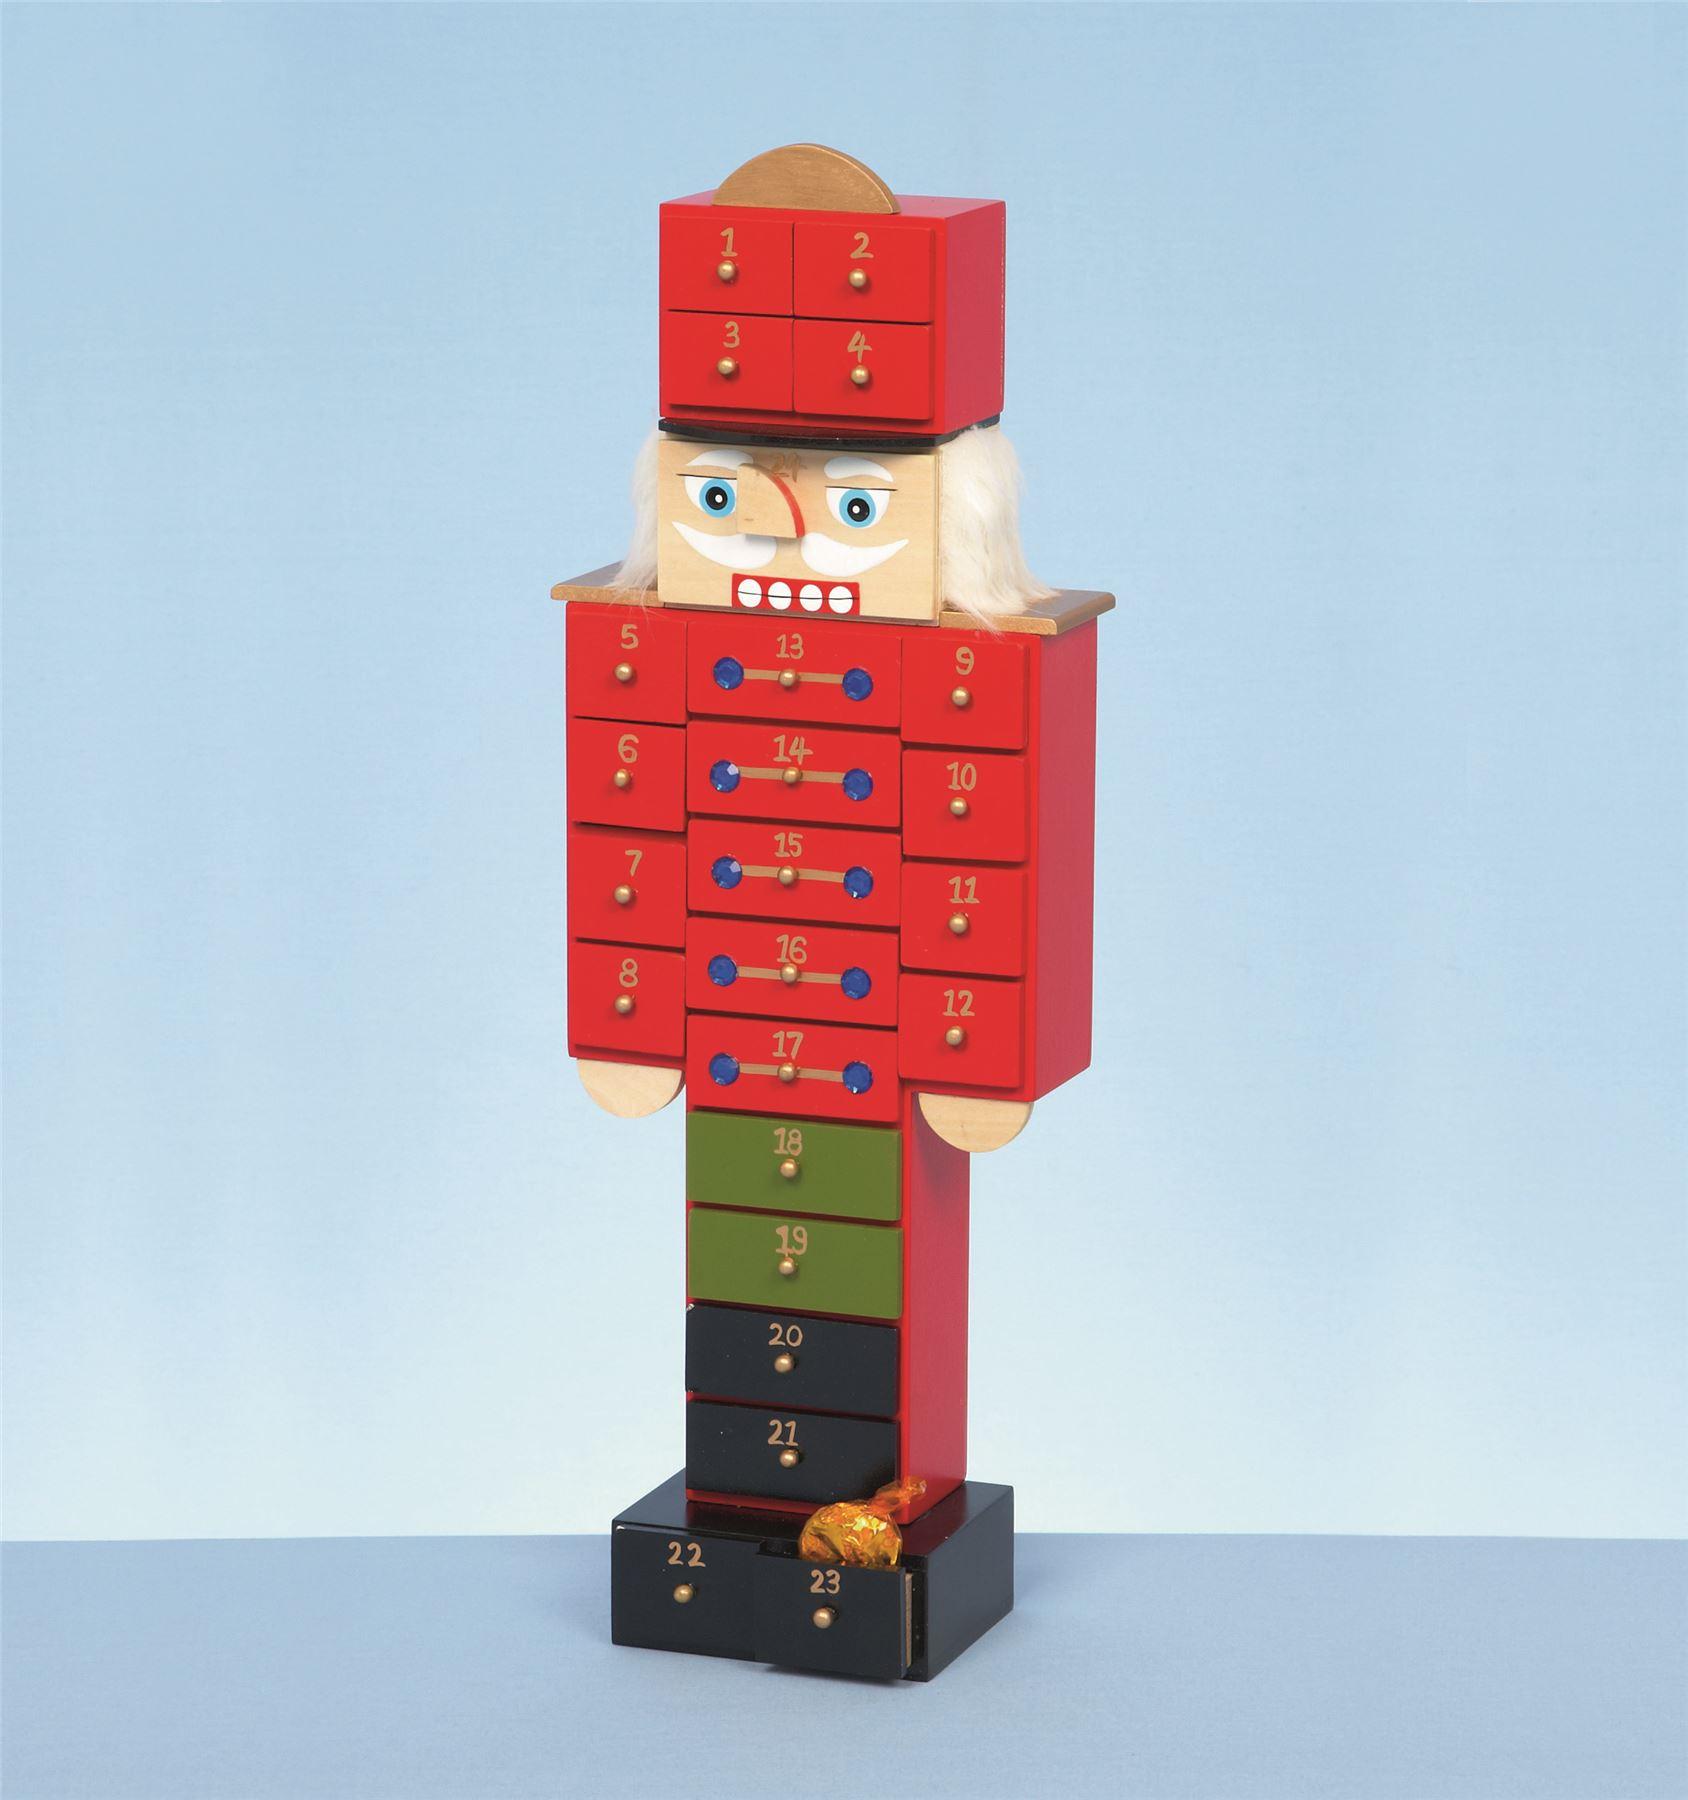 47cm Holz Nussknacker Soldat rot Adventskalender Weihnachten ...